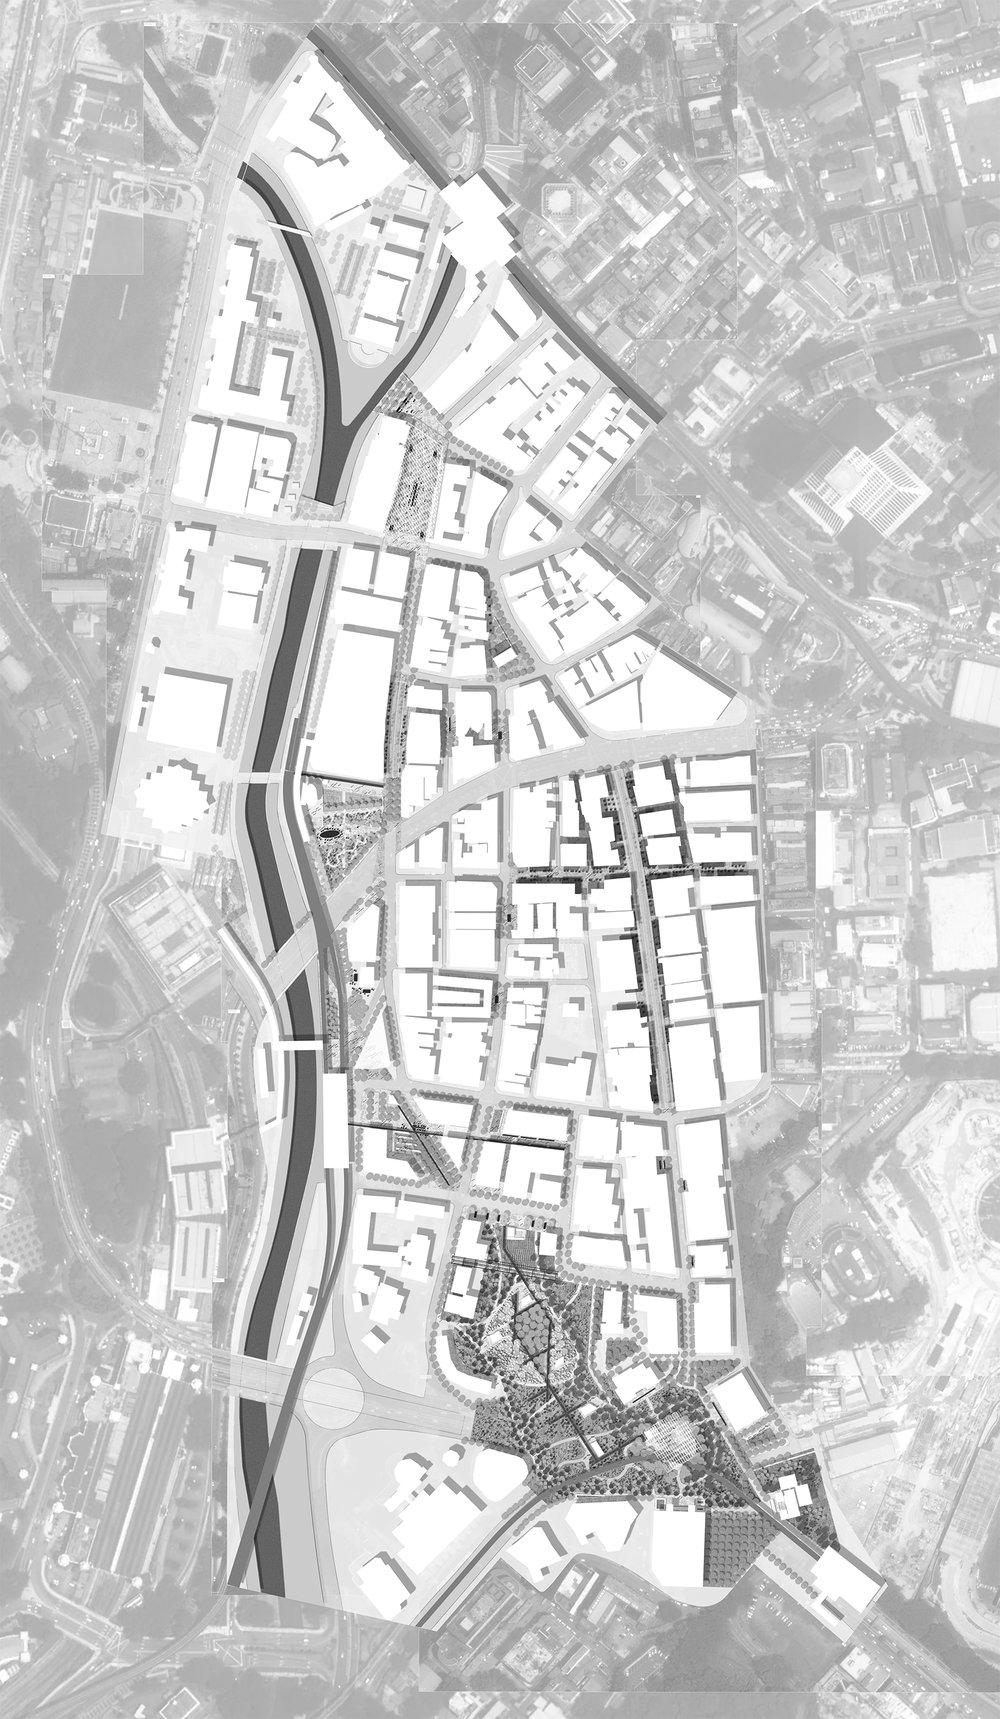 KL_Chinatown_IllustrativePlan _ aerial.jpg